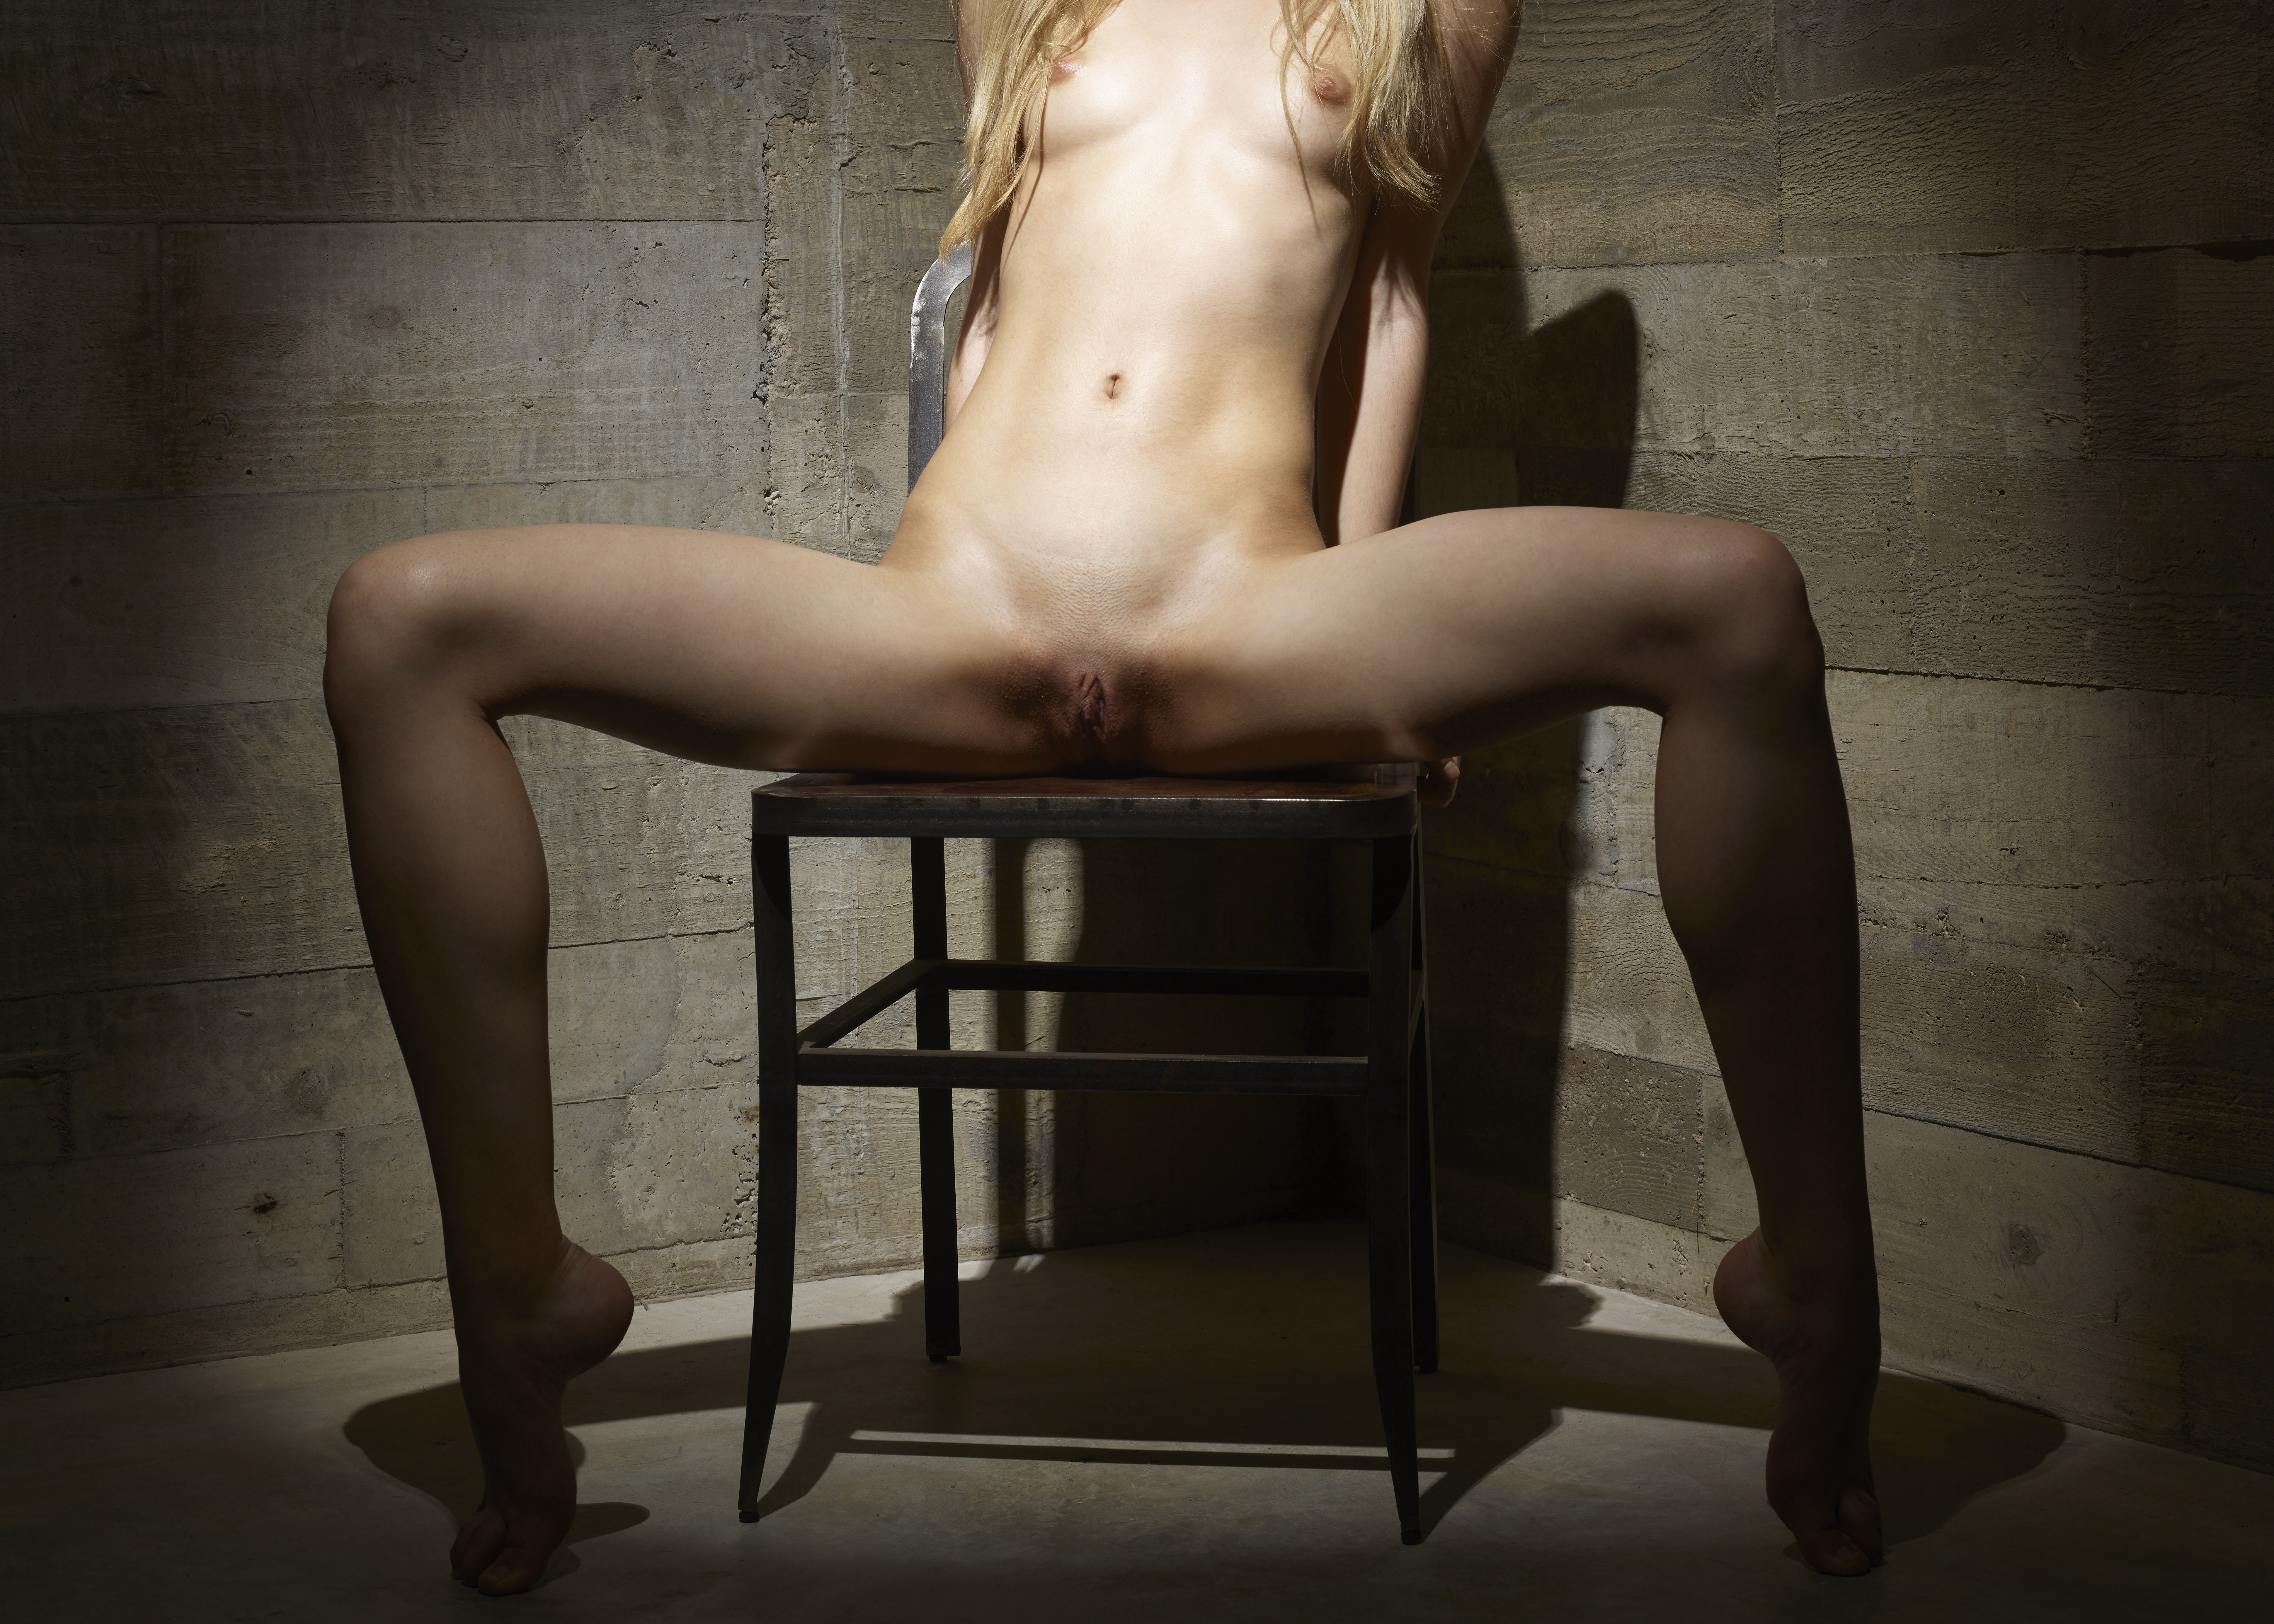 Midget fortune teller seduce the girls